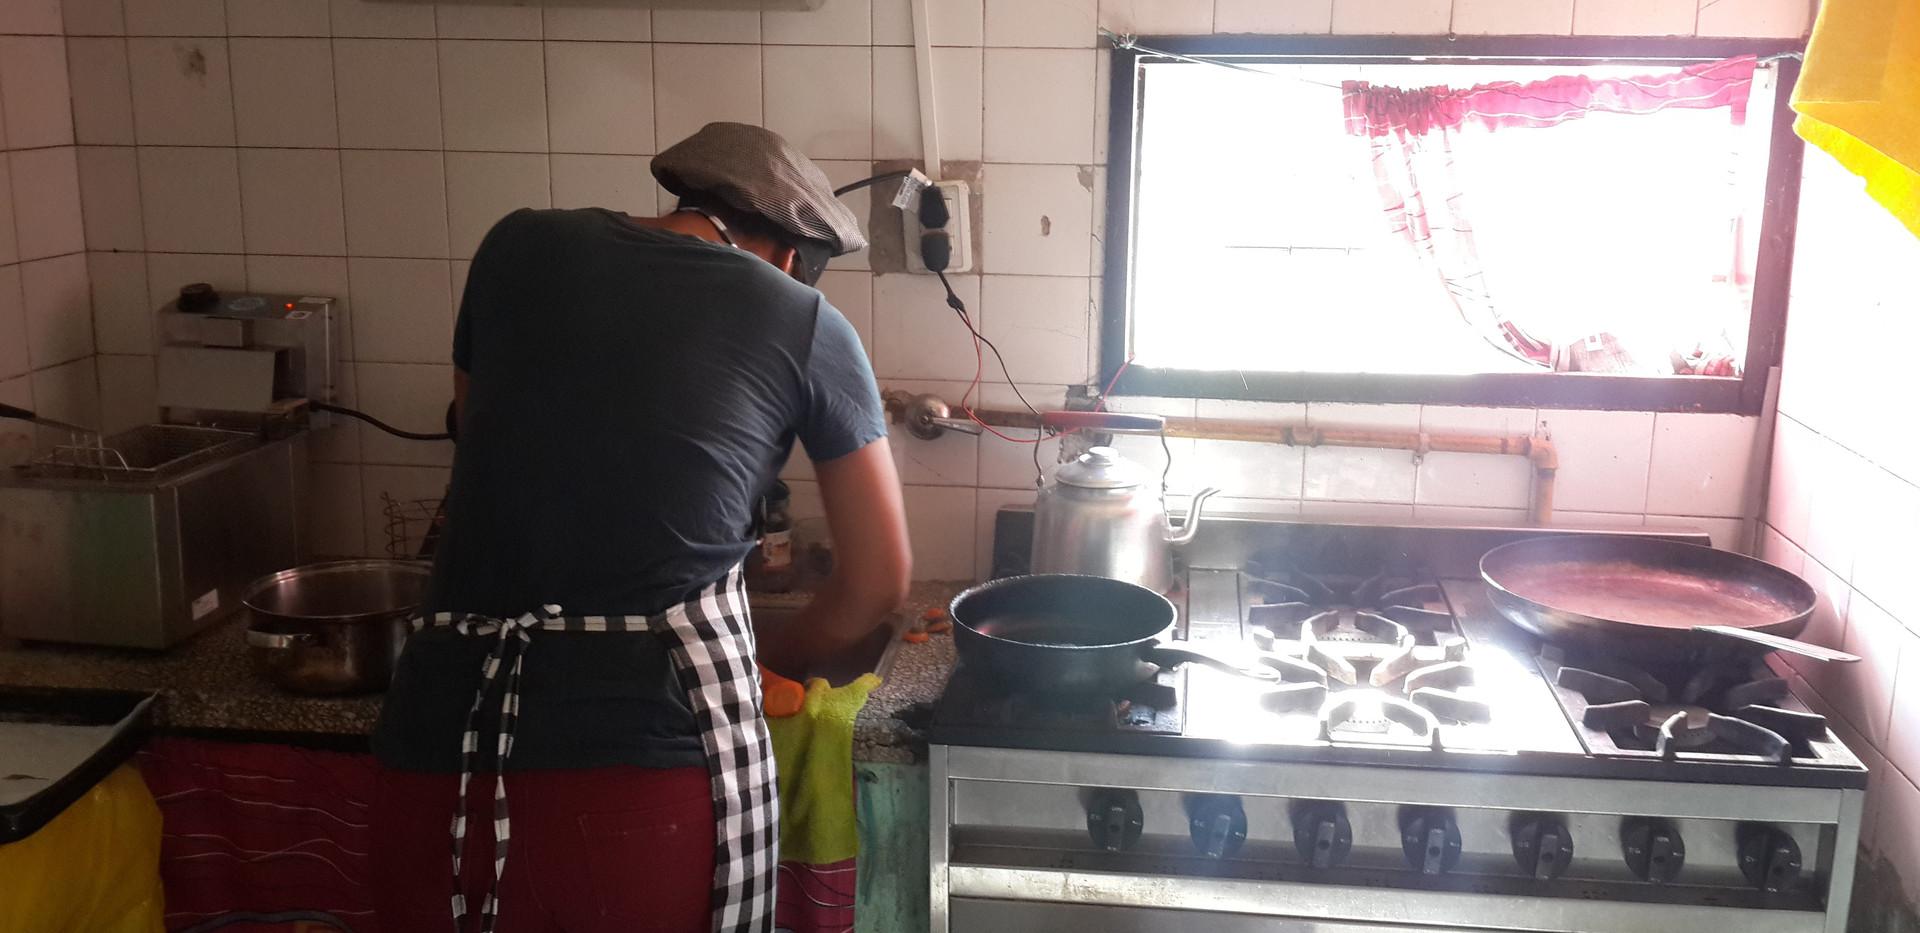 Site Kitchen Facilities